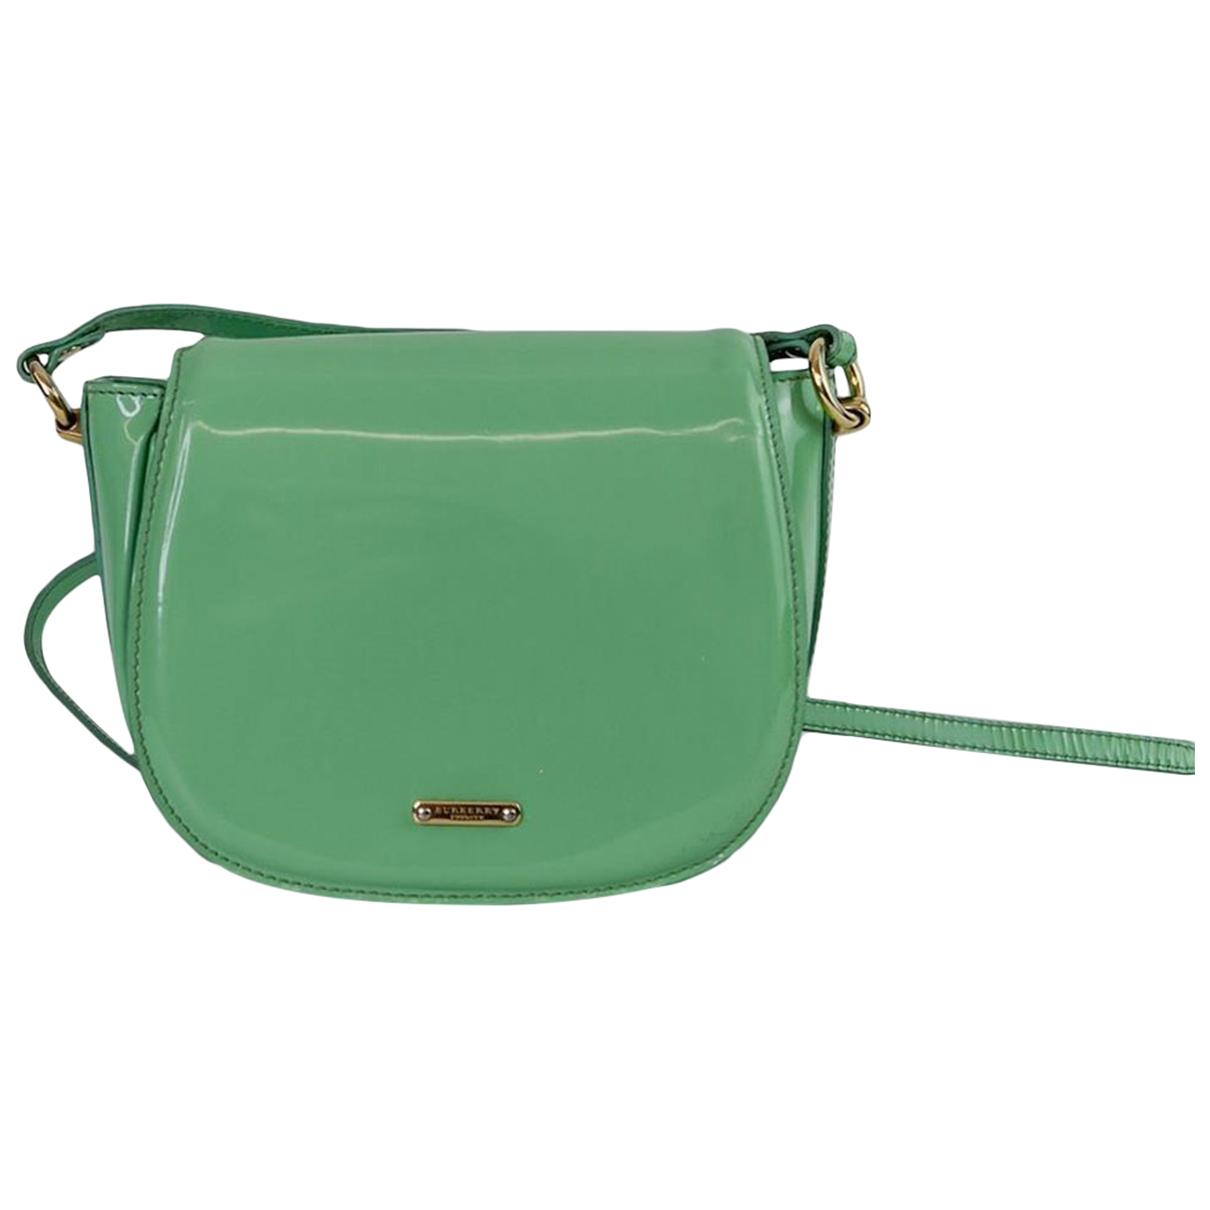 Burberry \N Handtasche in  Gruen Lackleder